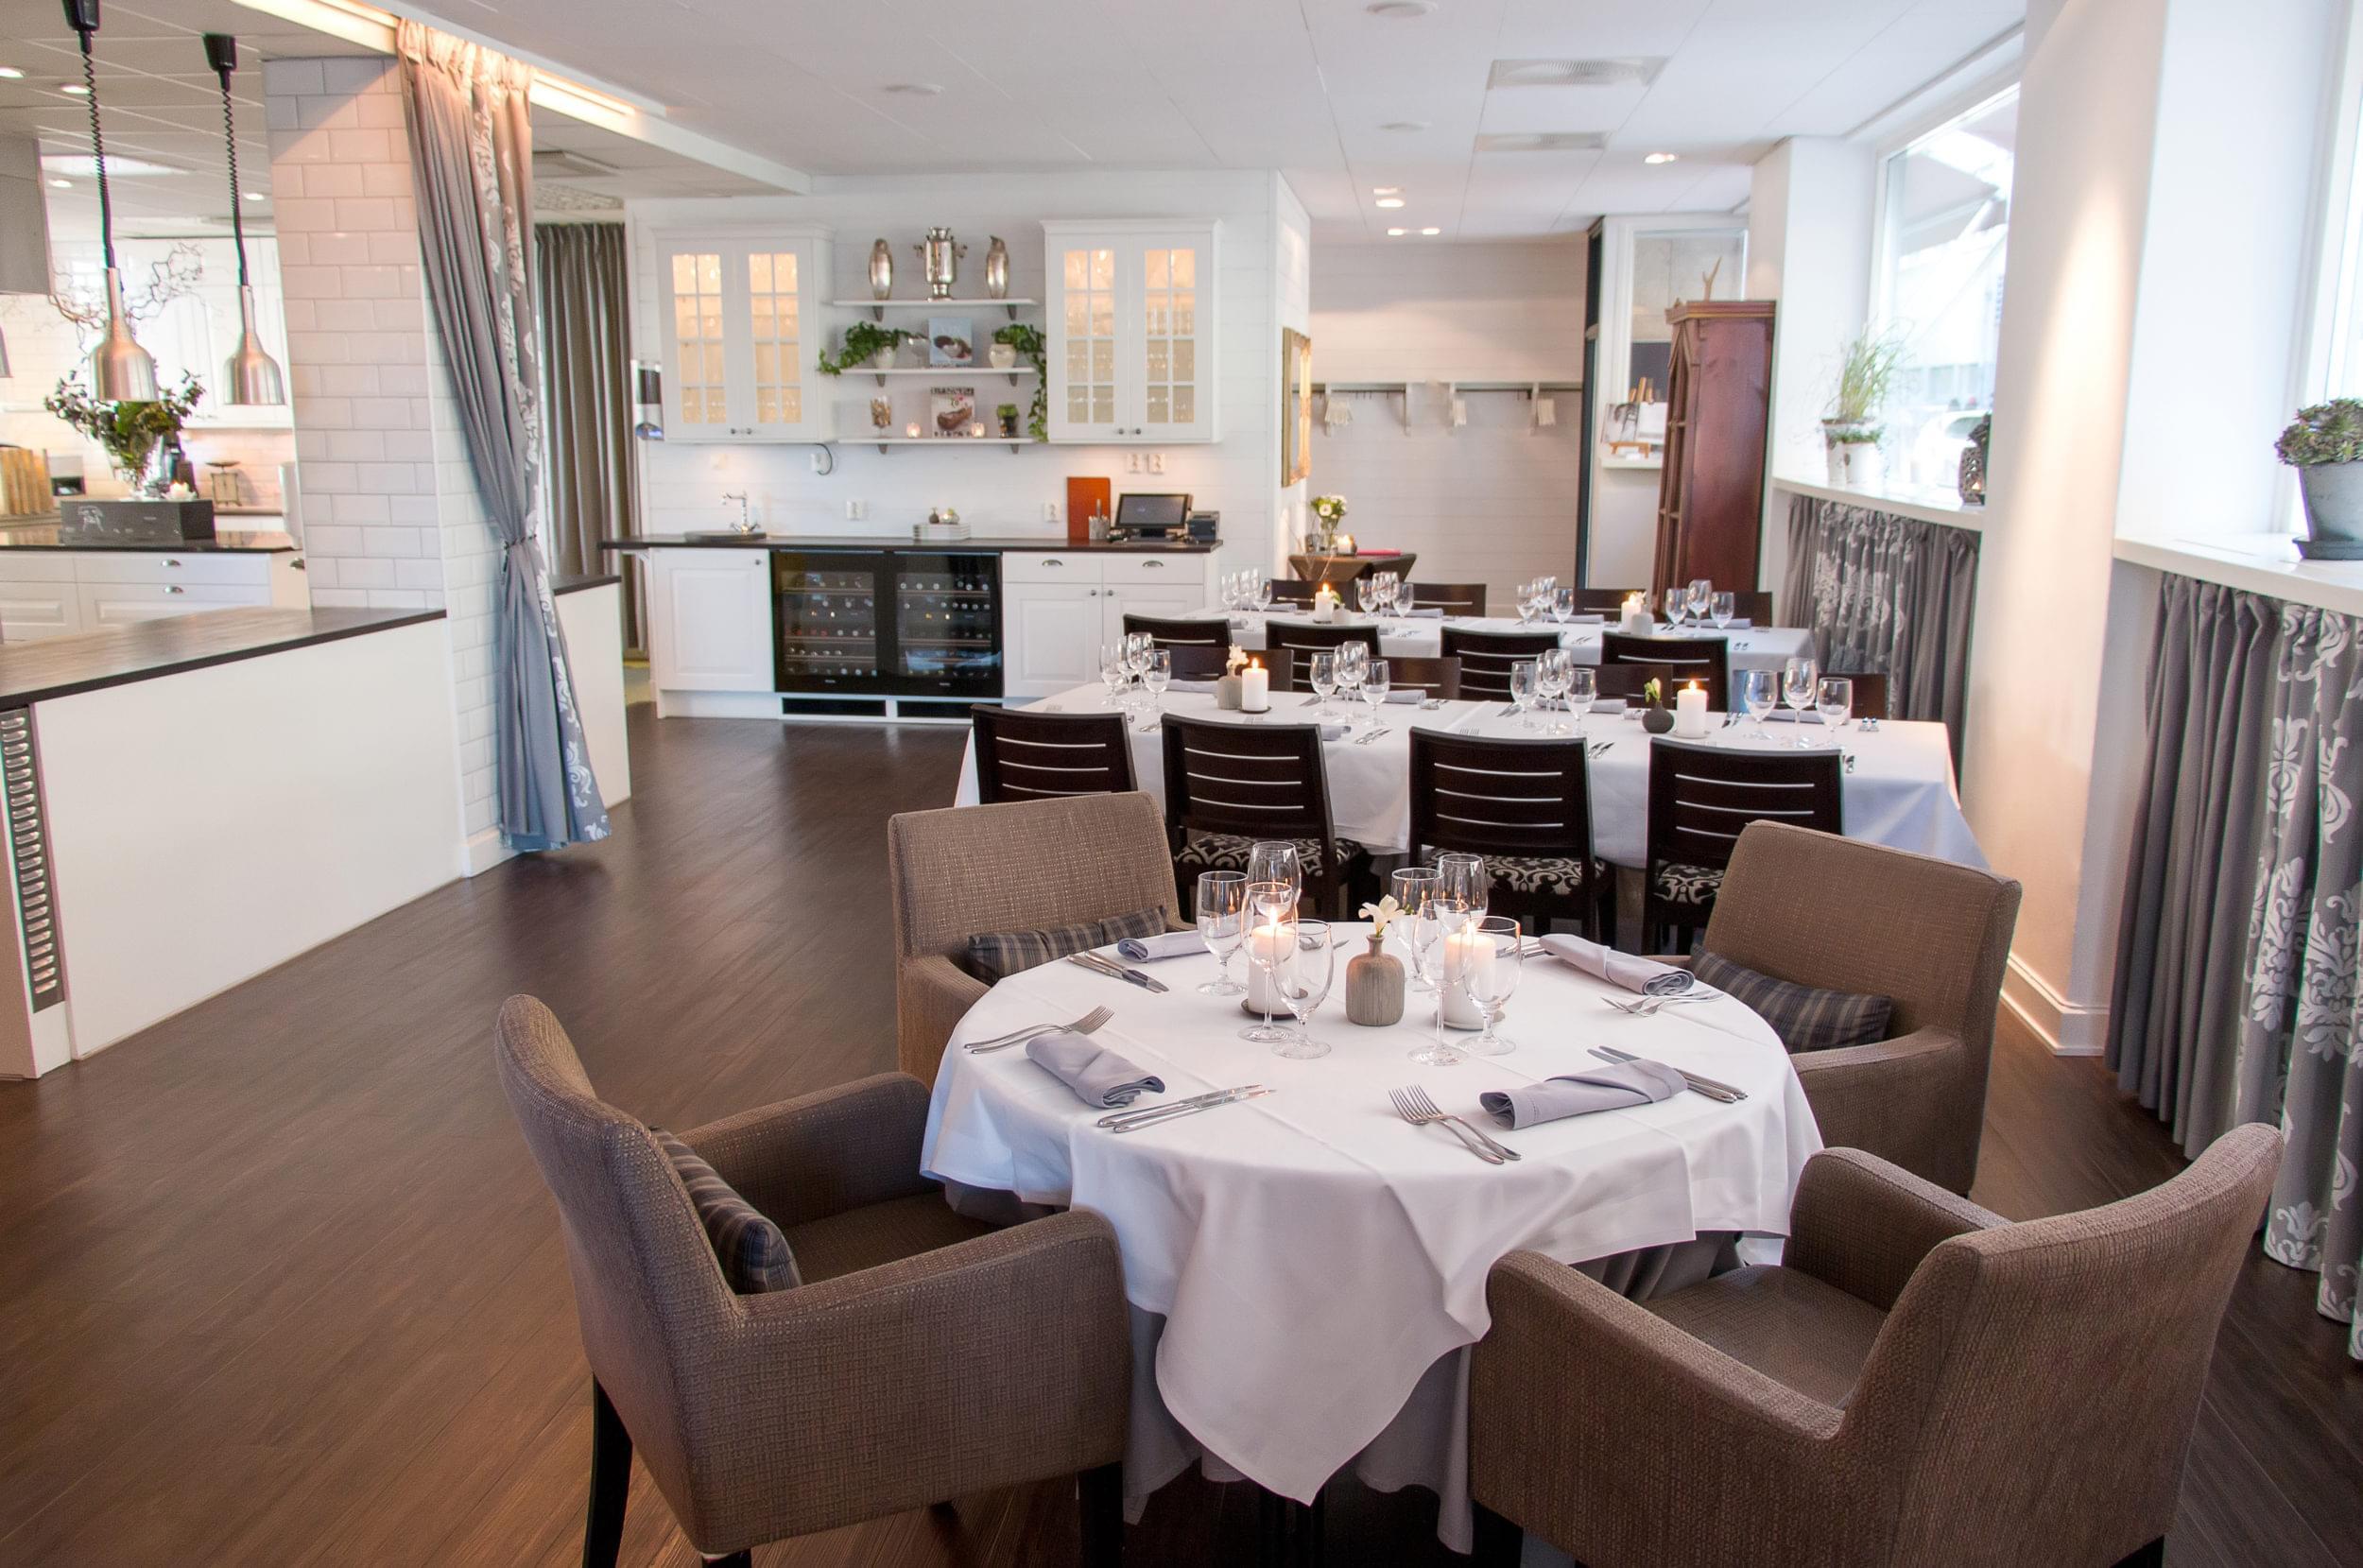 Inside, table setting